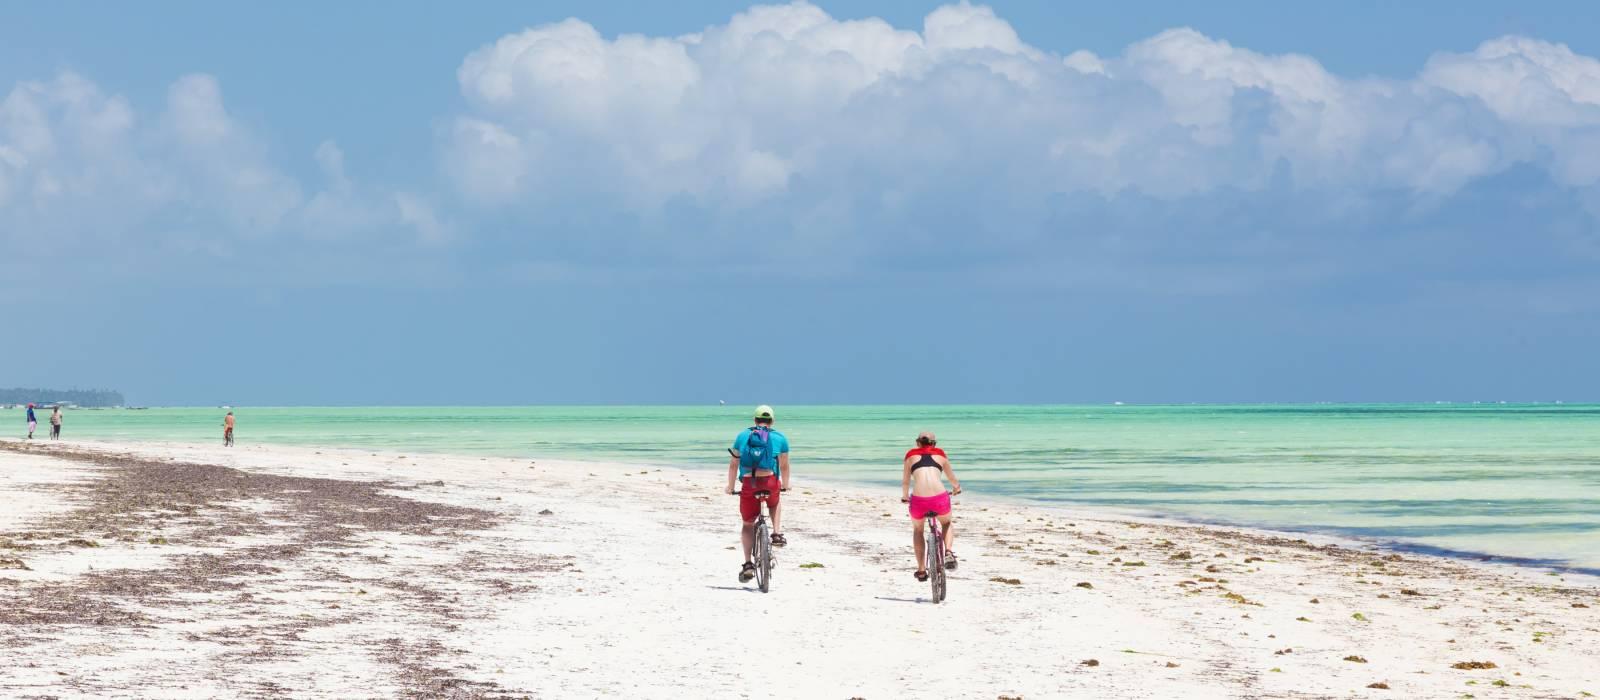 Tourist couple cycling down picture perfect white sand tropical beach of Paje village, Zanzibar, Tanzania, Africa